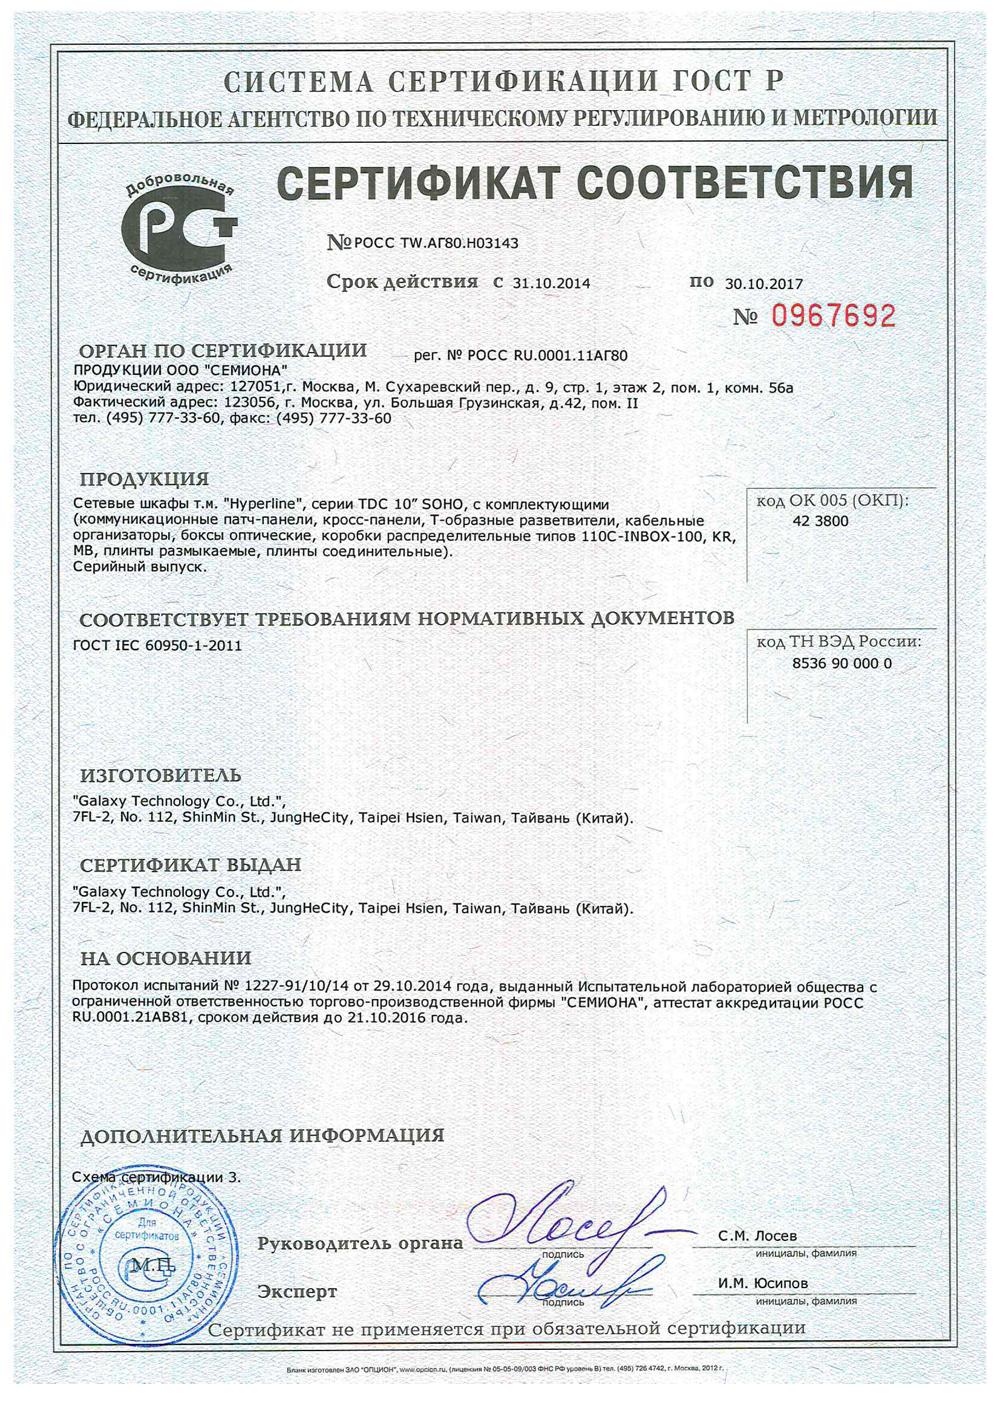 Сертификация кат.5е сертификация термины и определения.гост